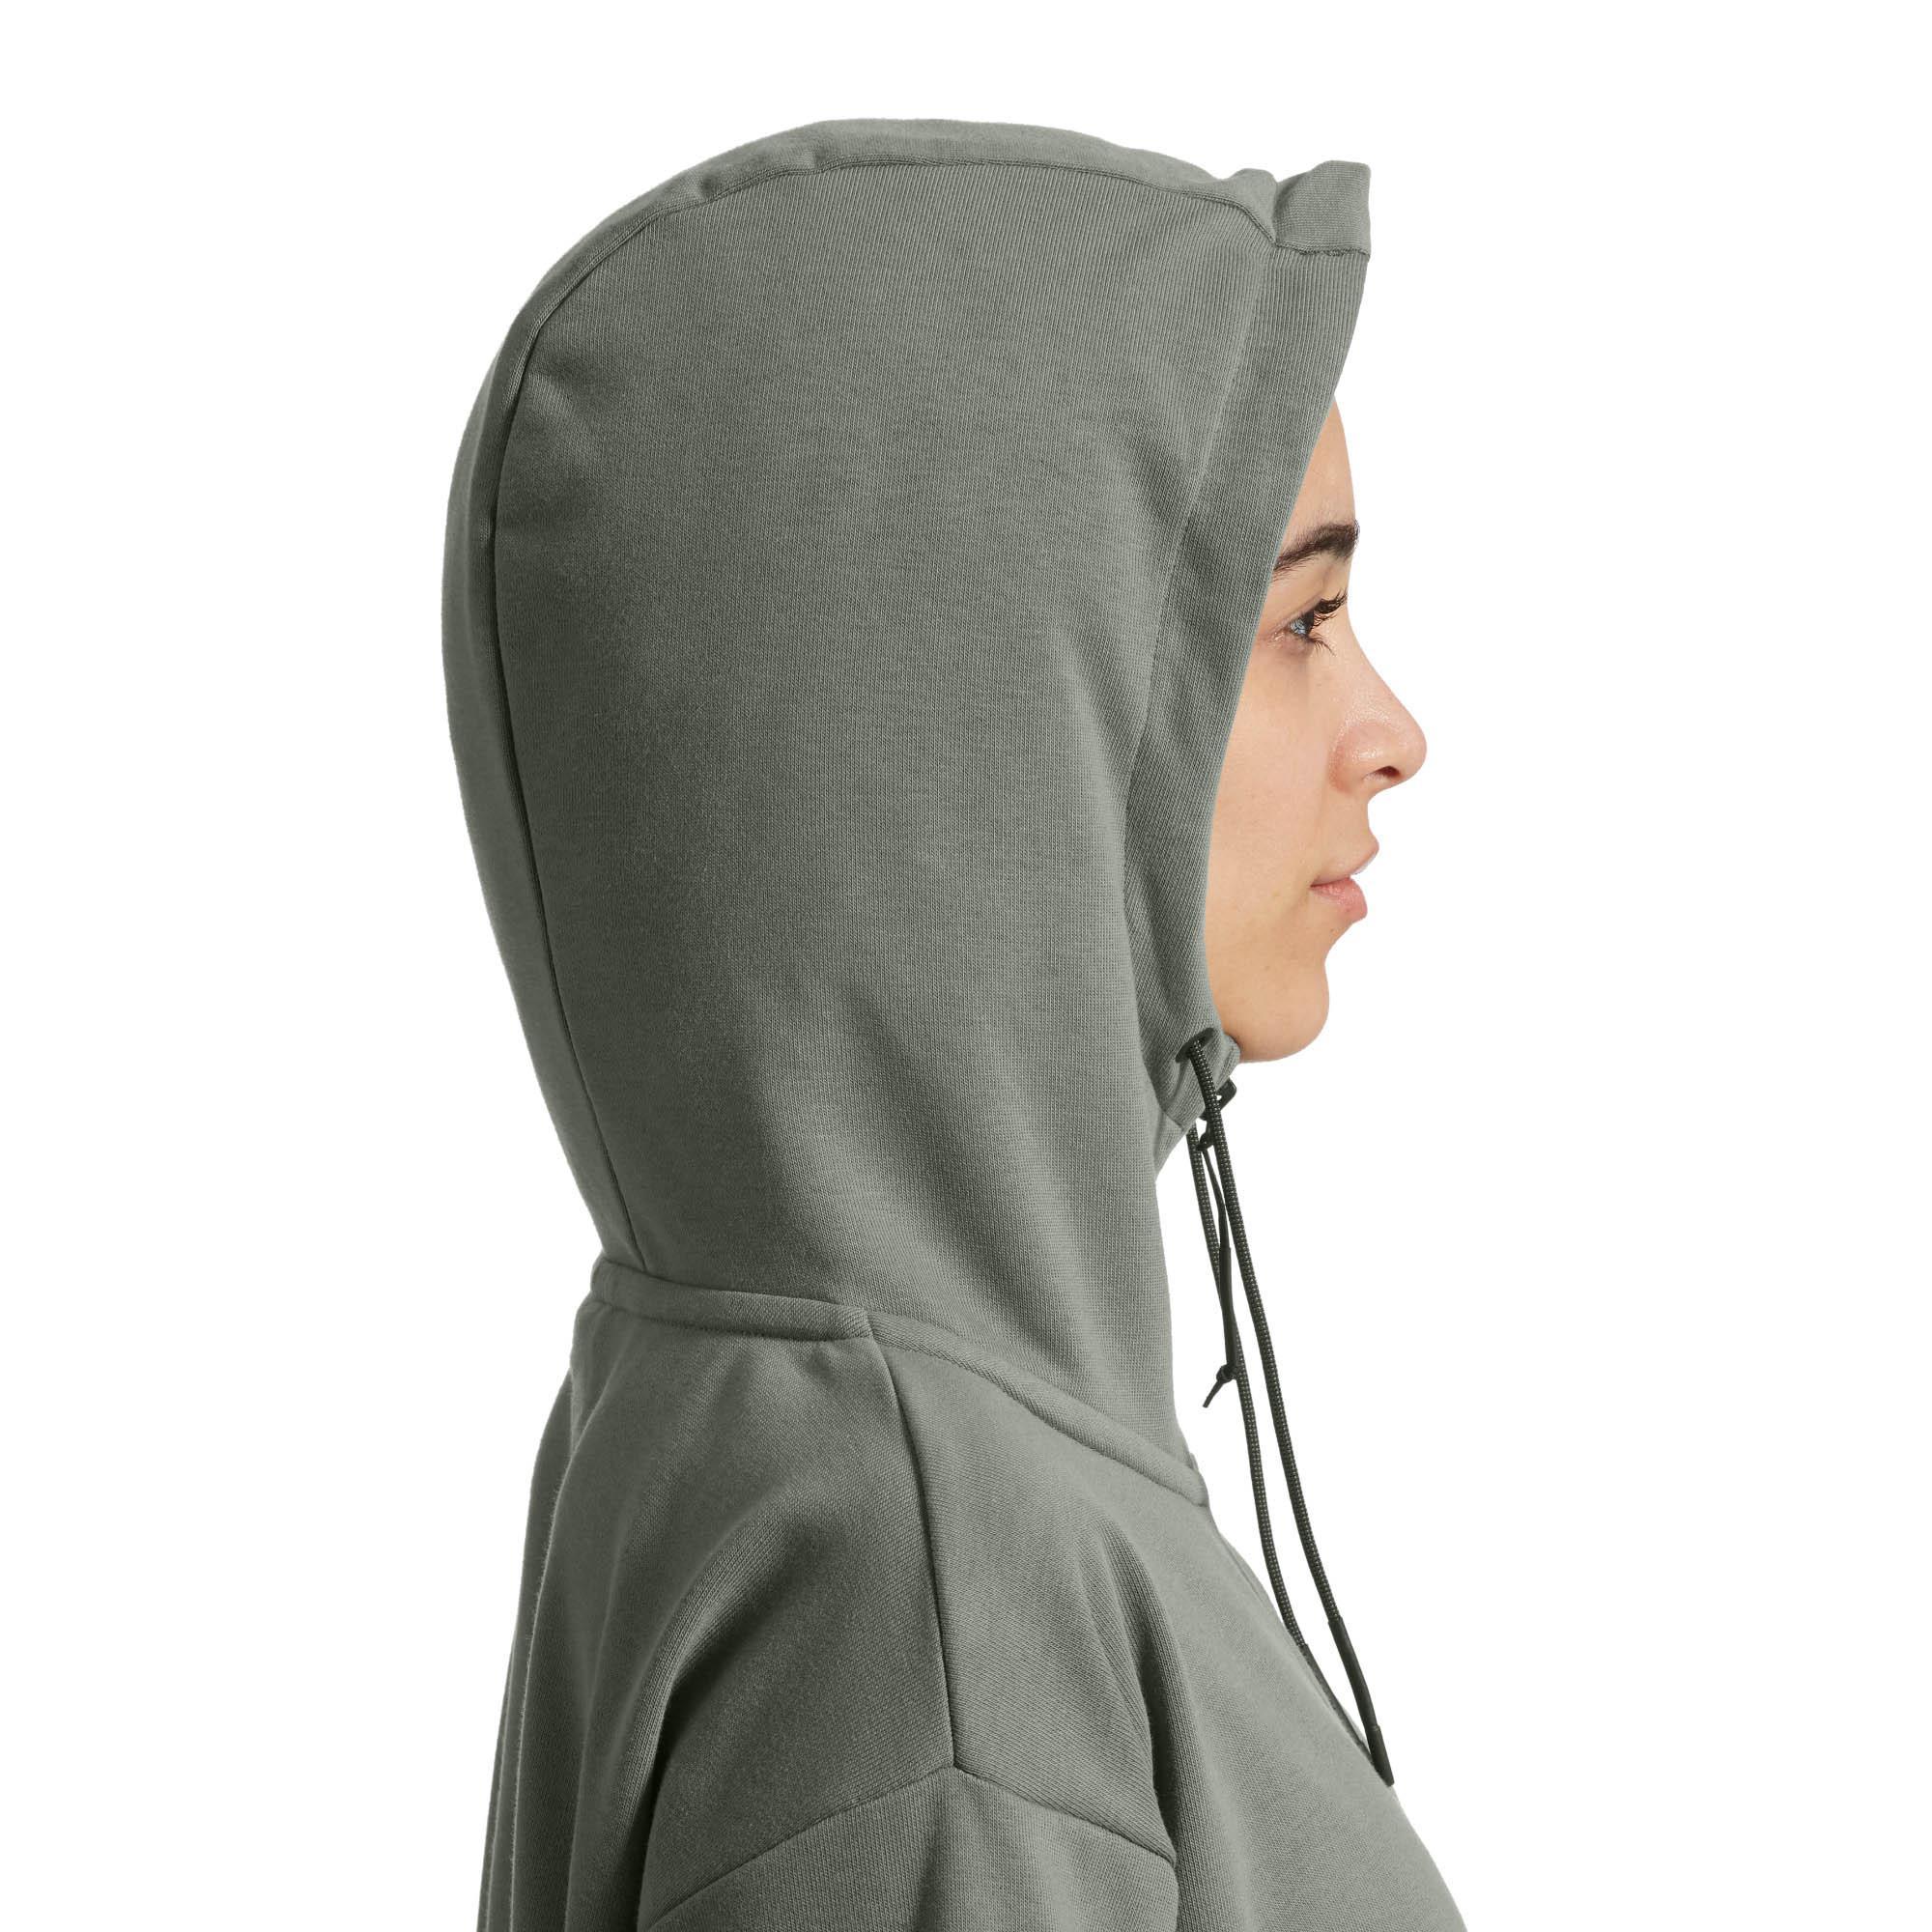 19133a8db1 PUMA Multicolor Ferrari Lifestyle Women's Hooded Sweat Jacket